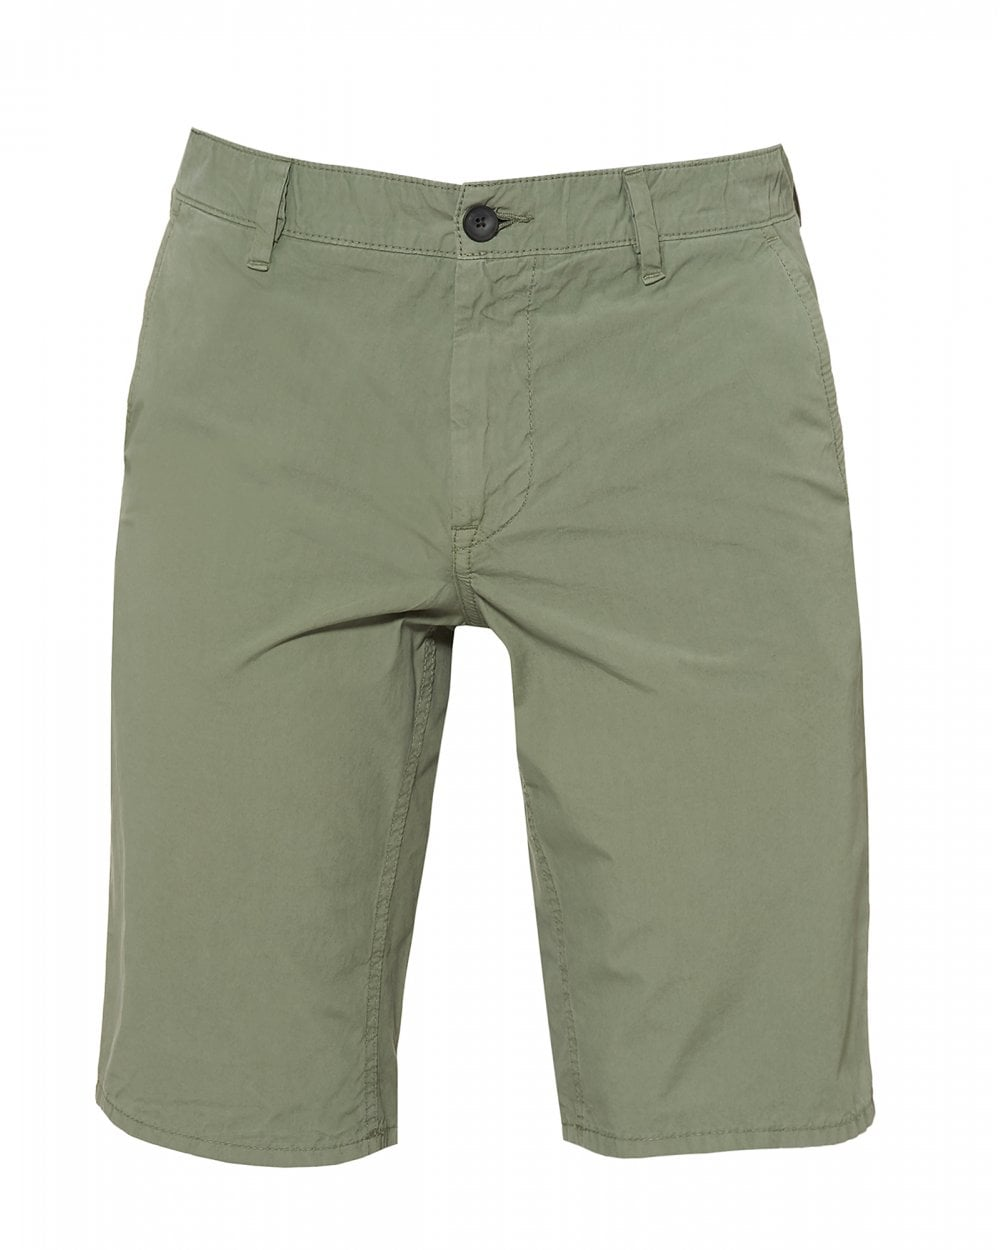 9c833c43 BOSS Casual Mens Schino-Slim-Shorts D Cotton Light Green Shorts